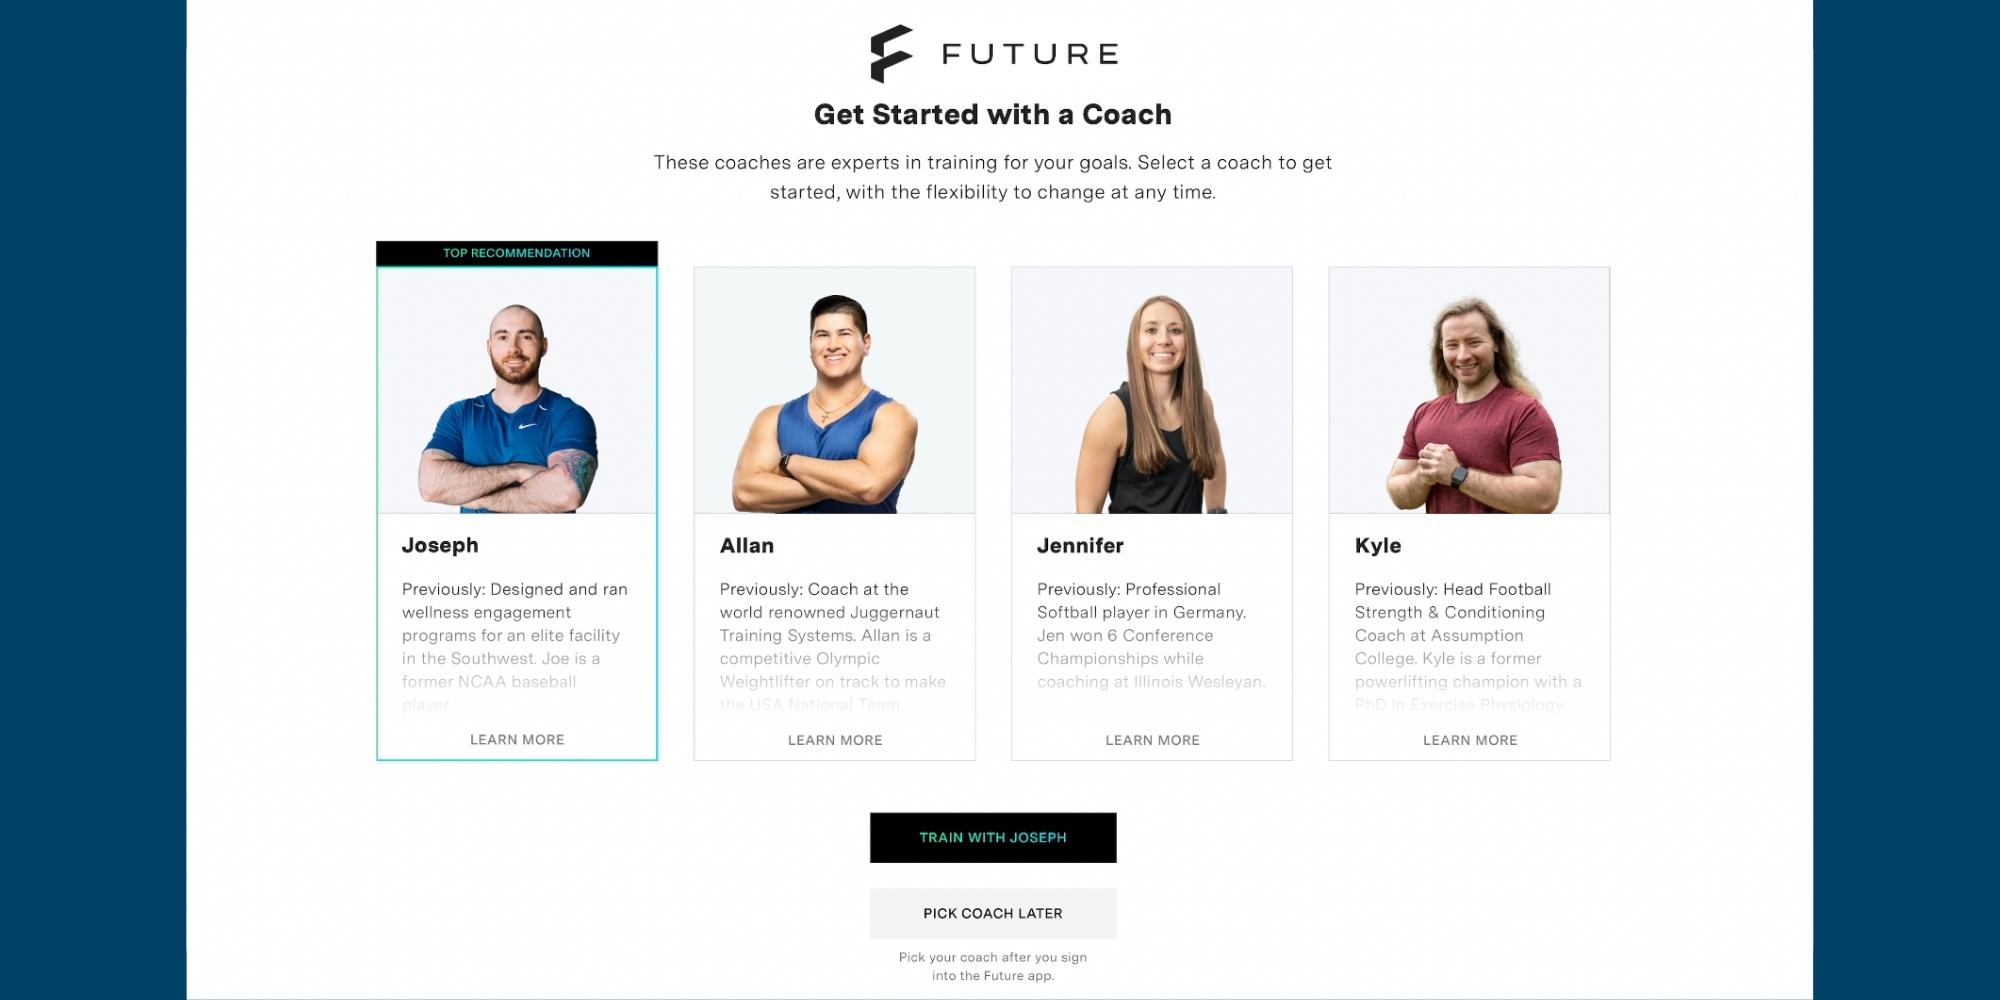 Future coaches